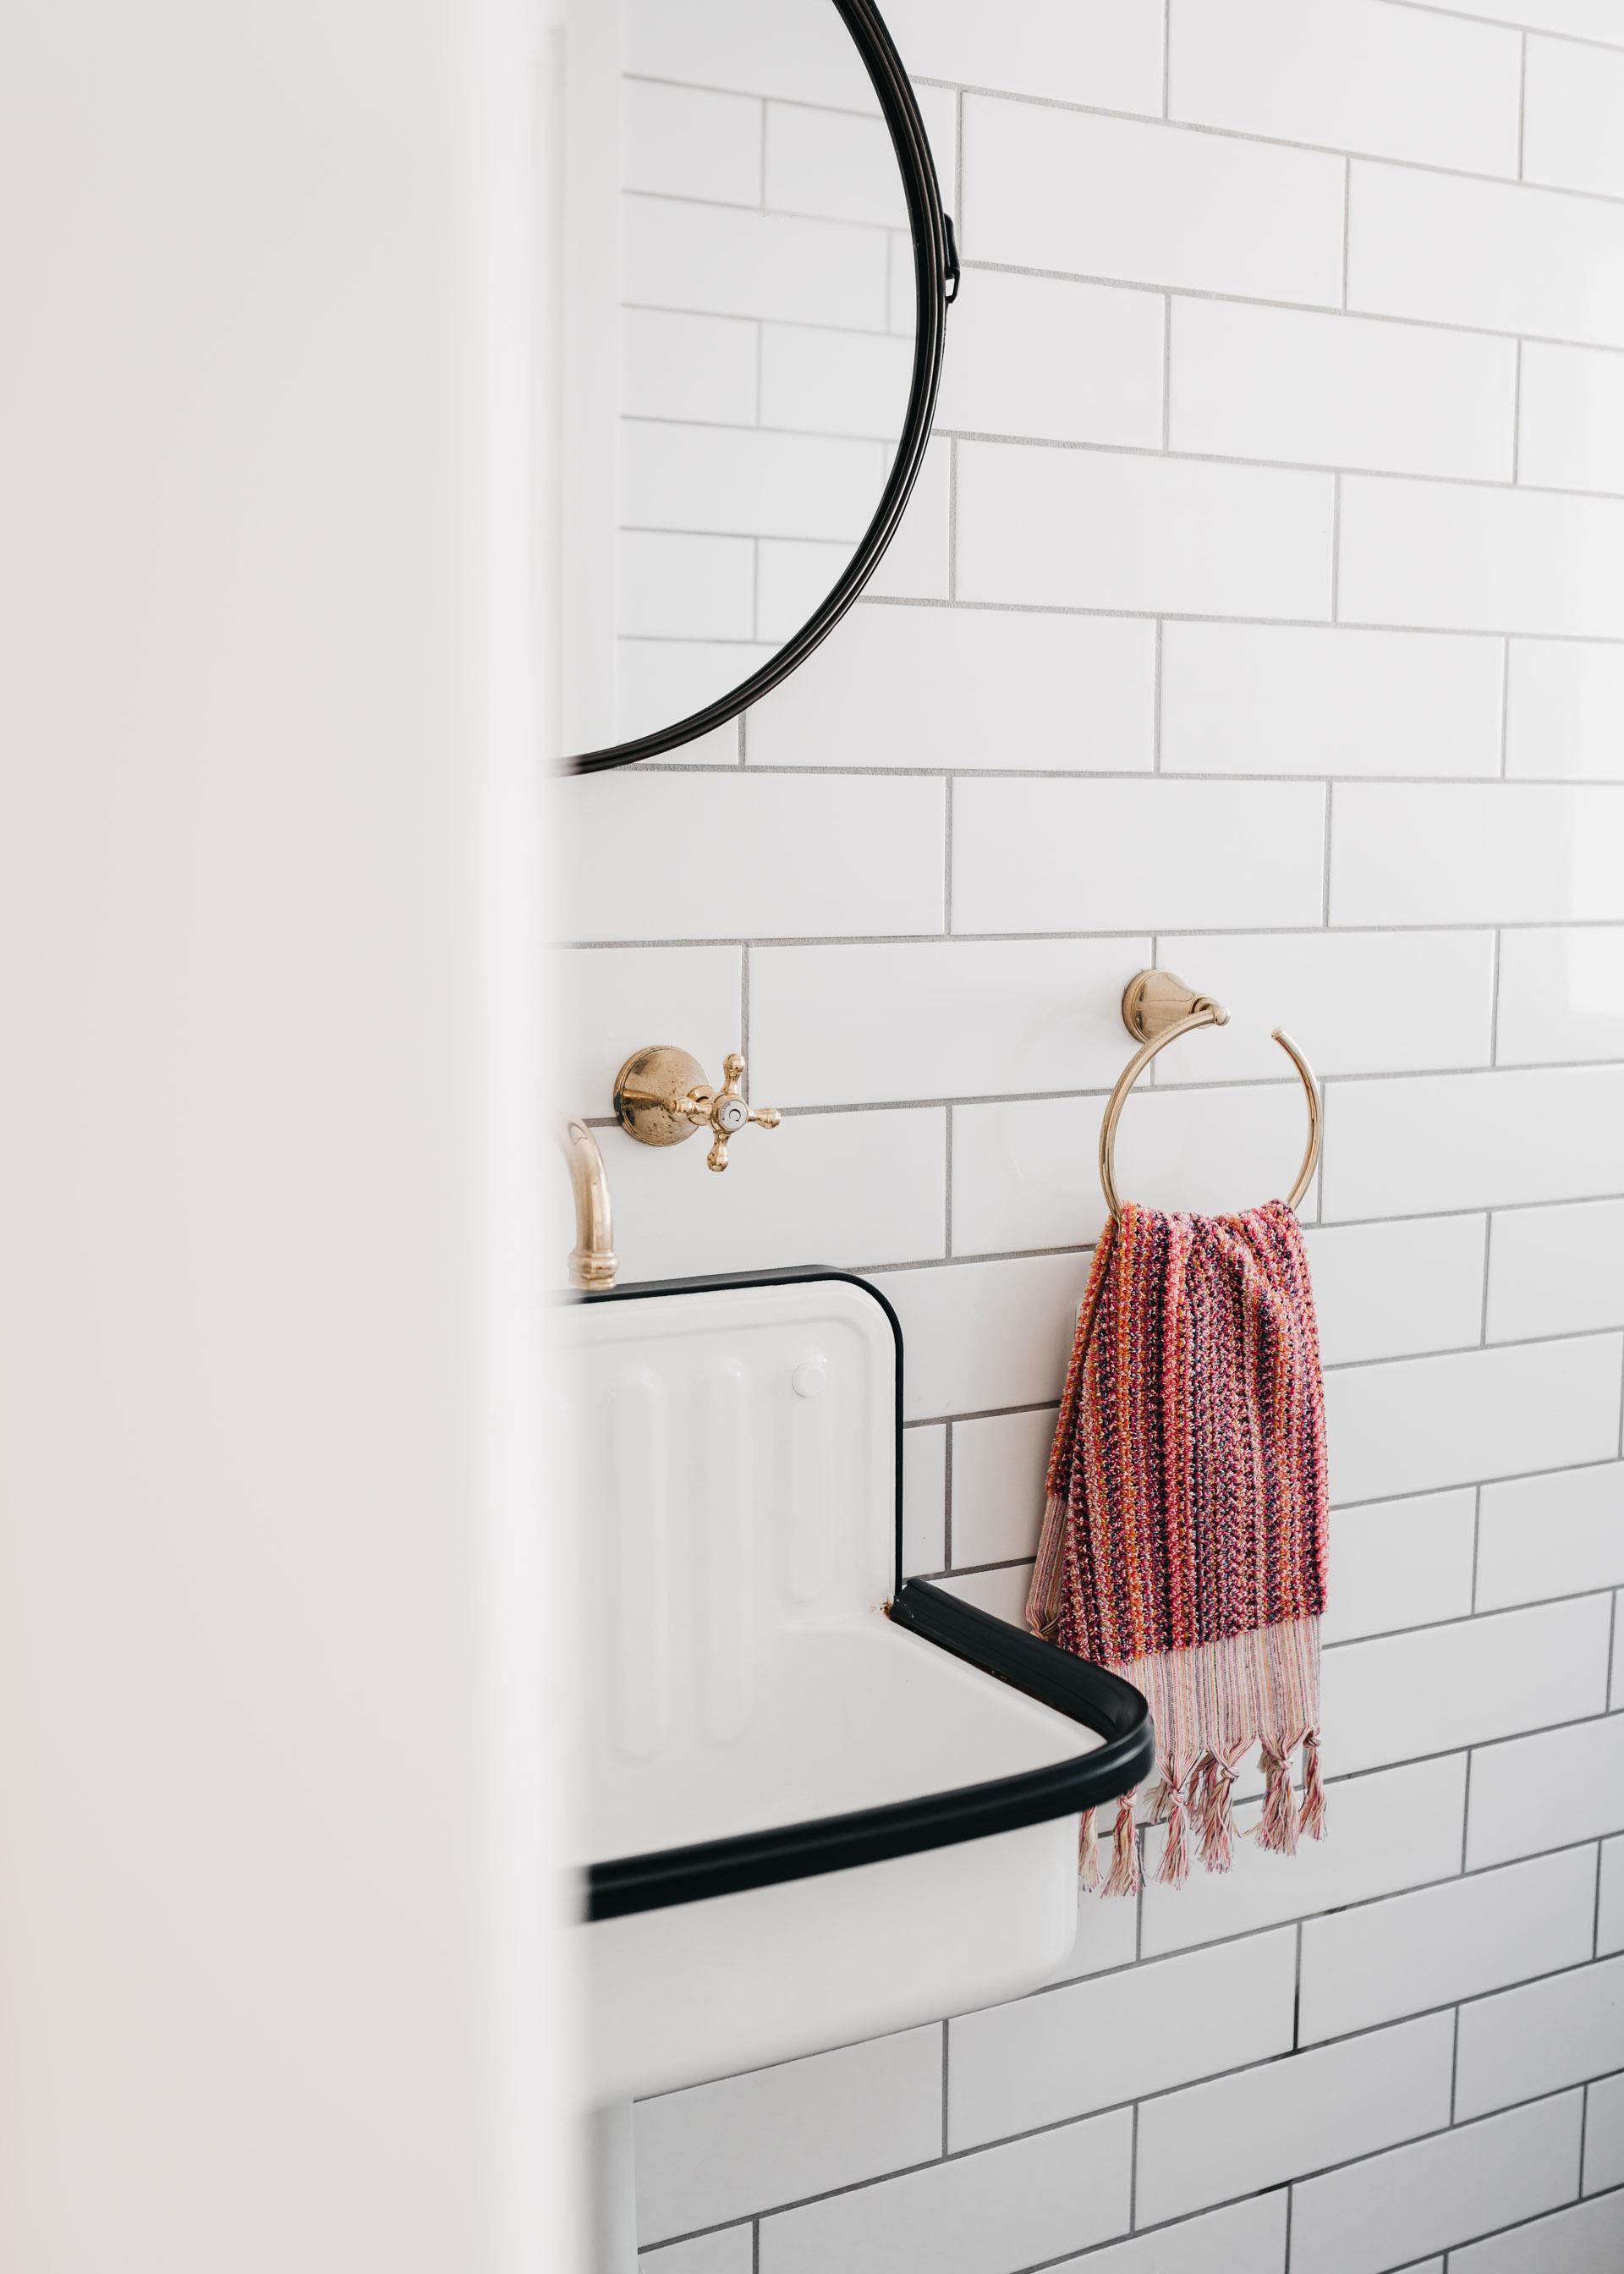 keira-mason-aegean-loom-hand-towel-pink-bathroom.jpg